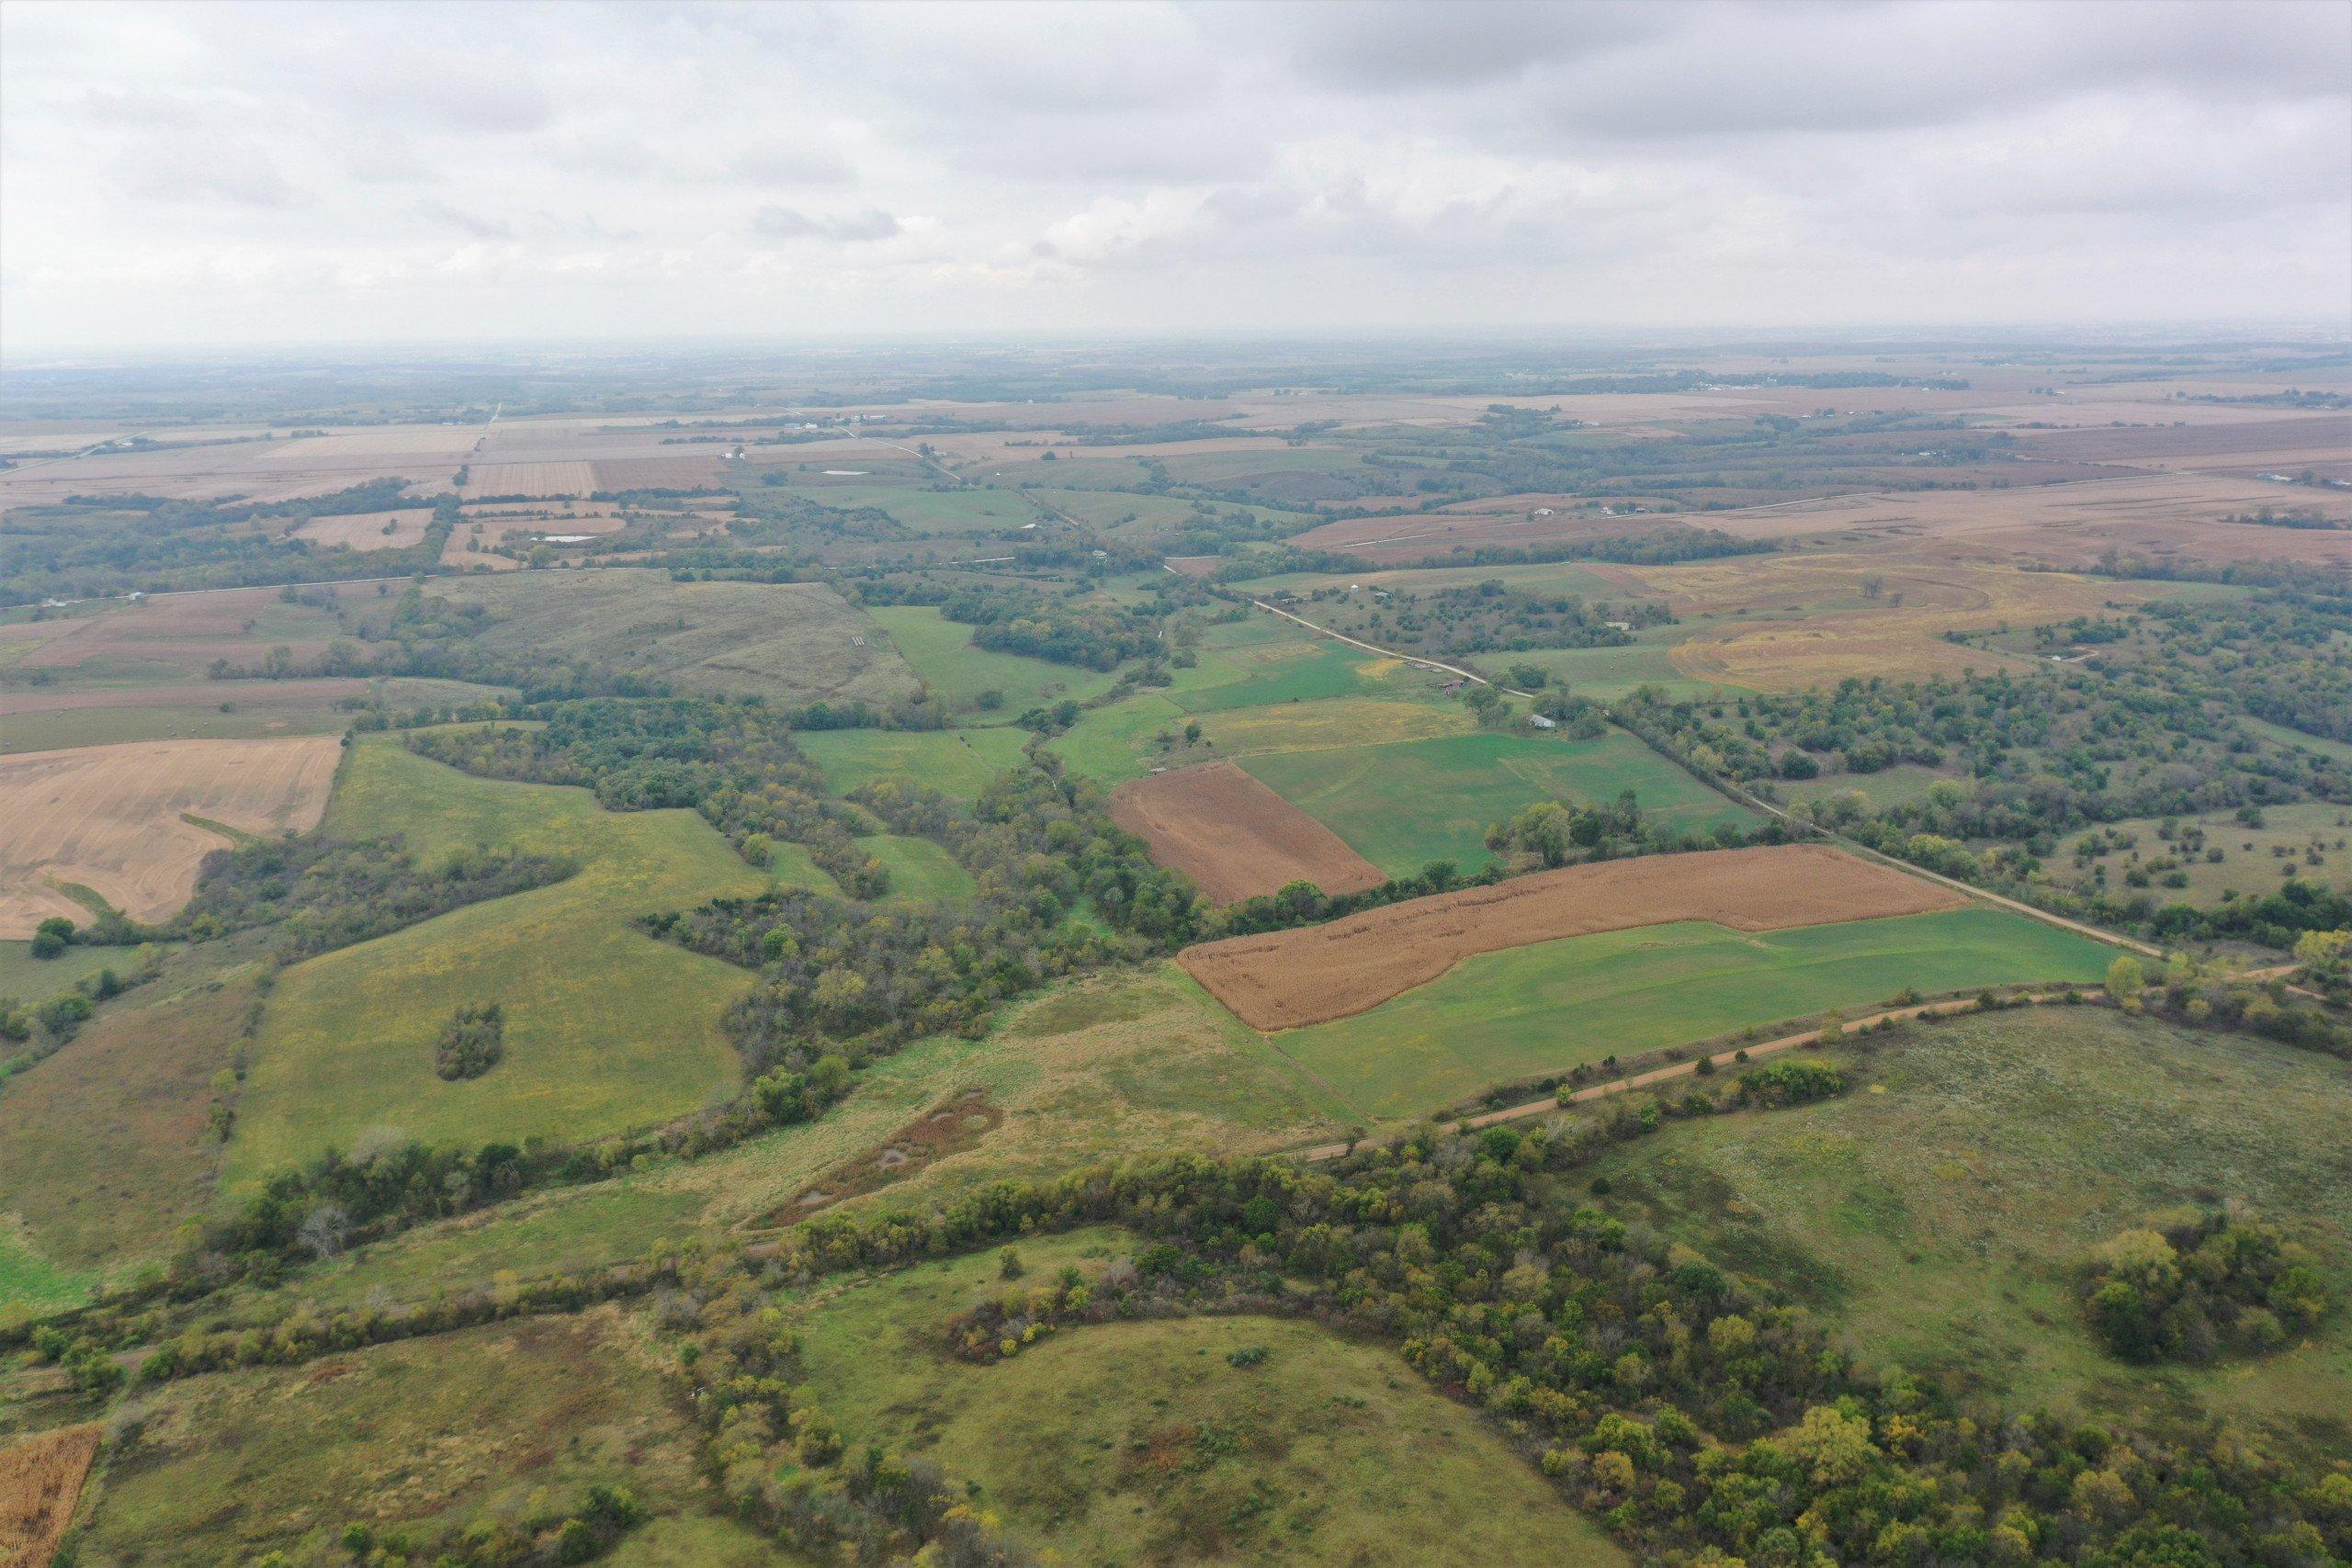 land-warren-county-iowa-200-acres-listing-number-15810-DJI_0585-2.jpg